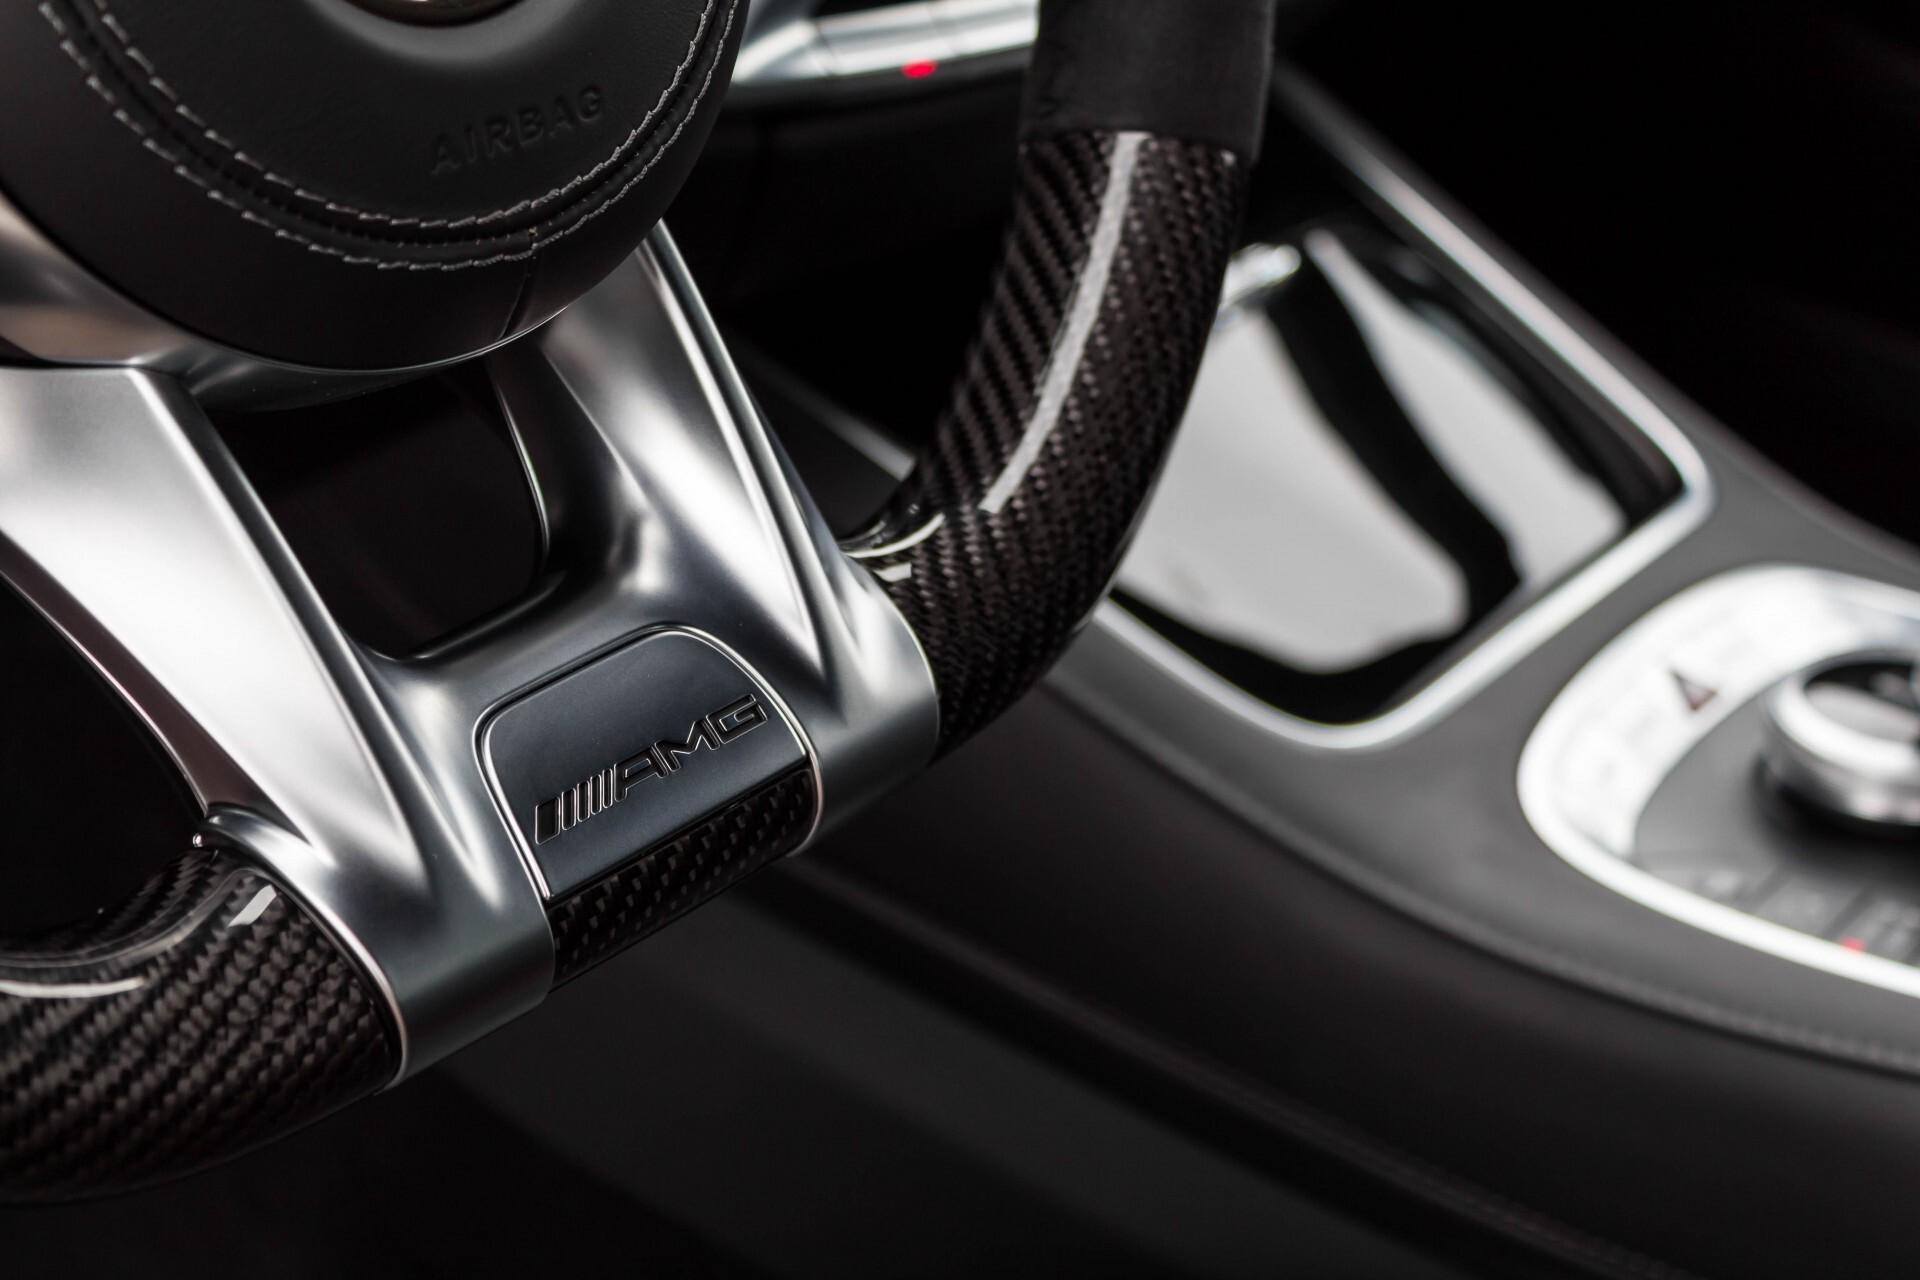 Mercedes-Benz S-Klasse Cabrio 63 AMG 4-M Ceramic/Designo/Carbon/Burmester High End Aut Foto 11